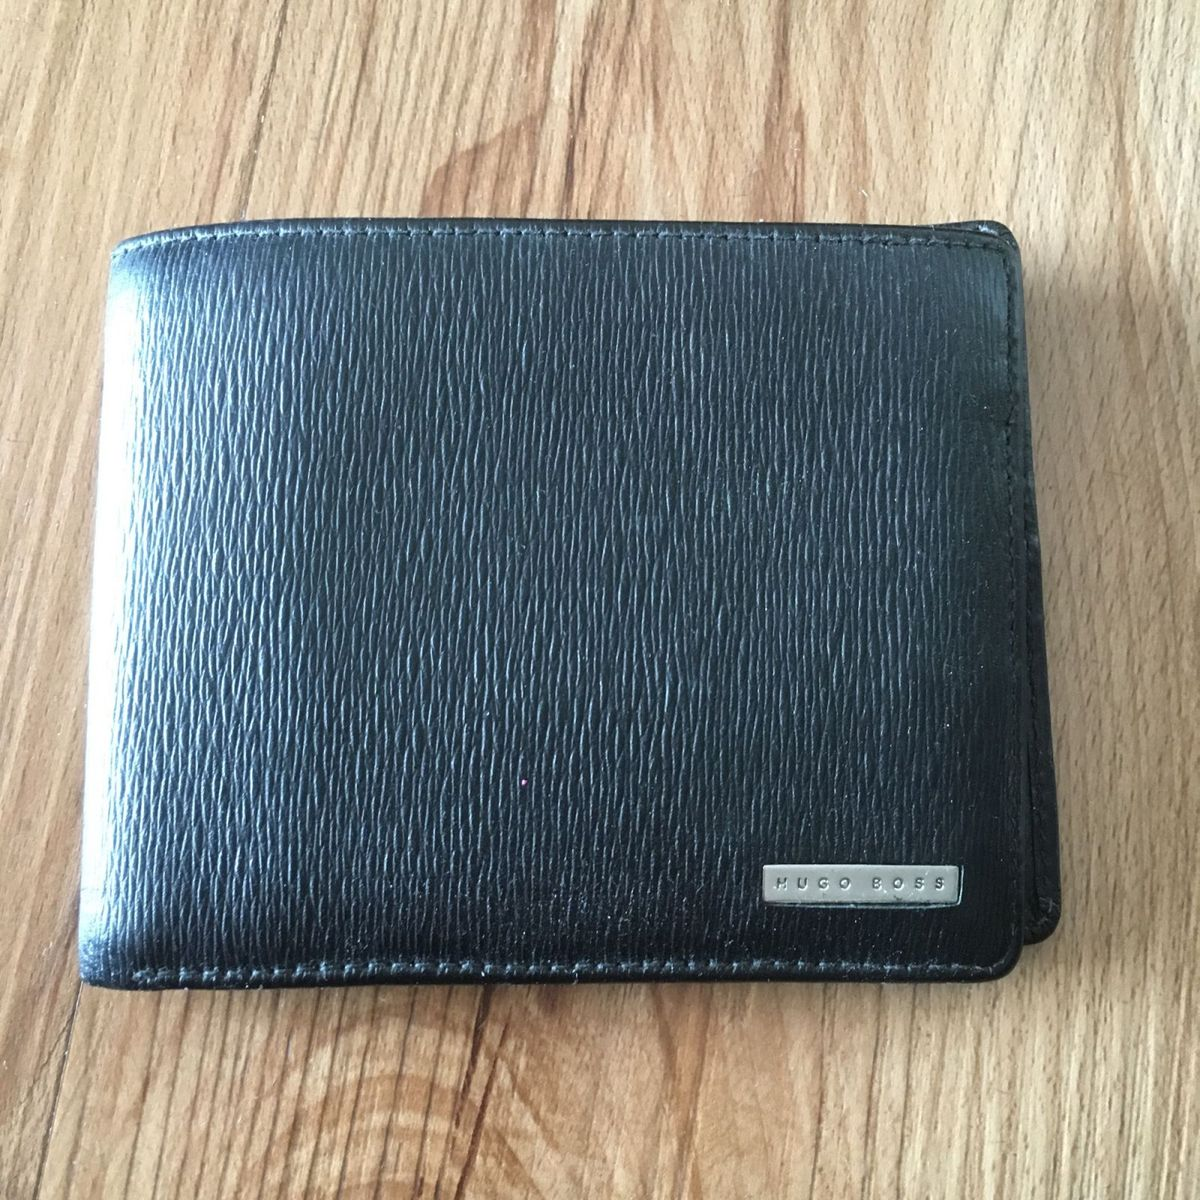 826eb114e carteira masculina hugo boss - carteiras hugo-boss